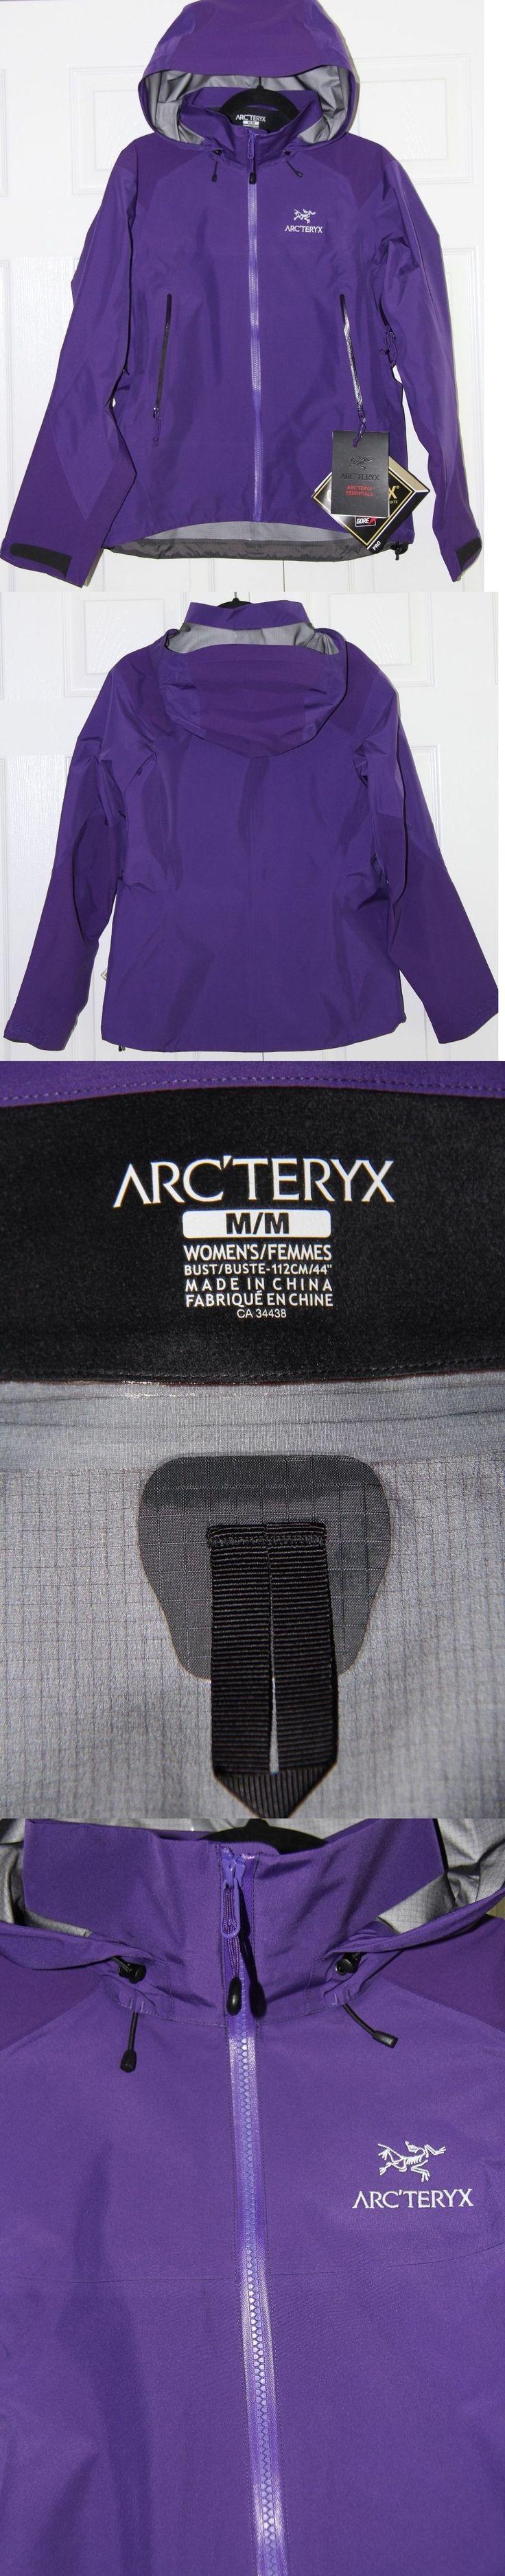 Coats and Jackets 181365: Arc Teryx Beta Ar Gore-Tex Pro Jacket Women S - Medium M - Azalea (Purple) - New -> BUY IT NOW ONLY: $517.45 on eBay!